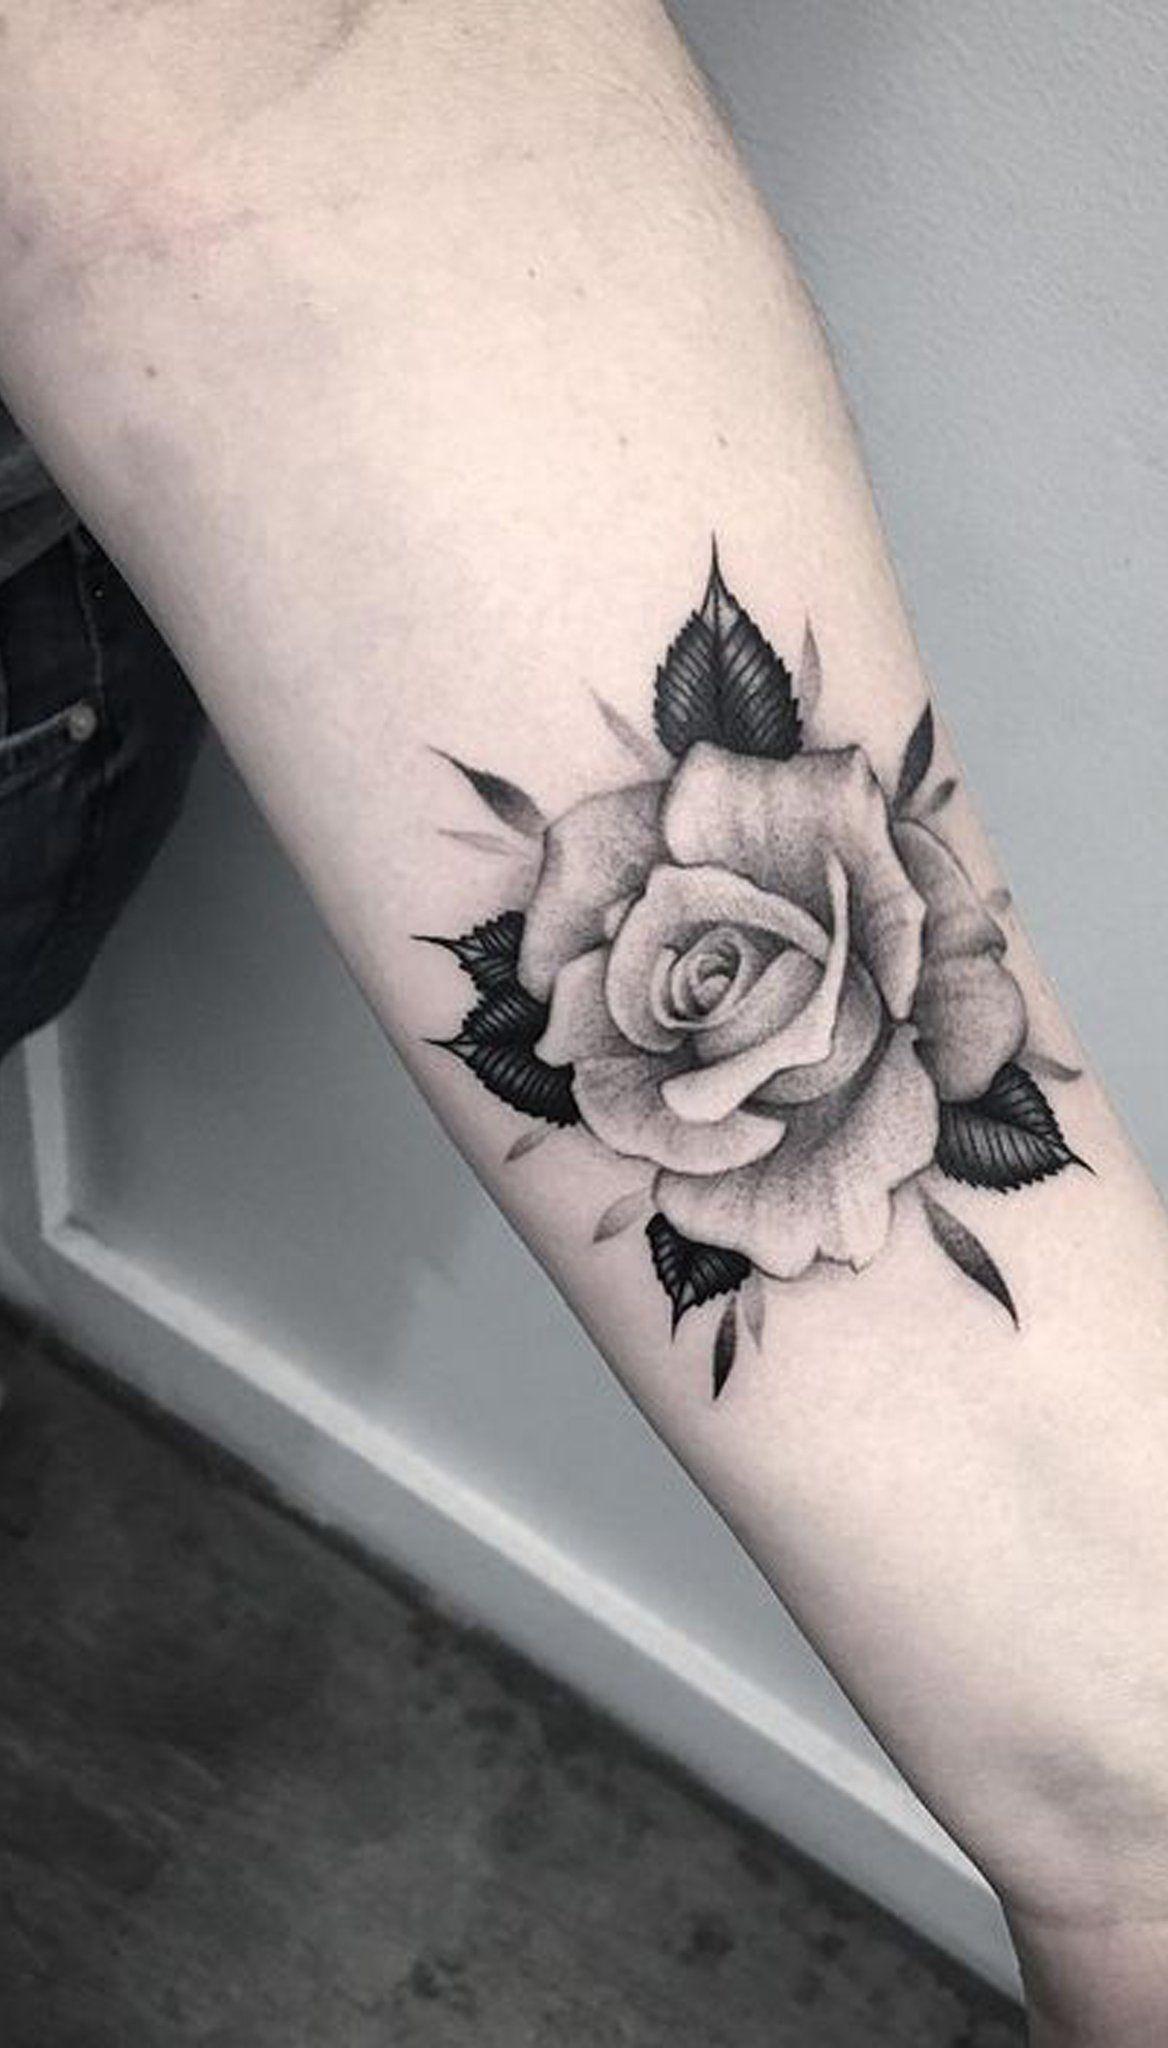 Roses Tattoo Black And White : roses, tattoo, black, white, Beautiful, Tattoo, Ideas, Vintage, Flower, Tattoo,, Realistic, Tattoos